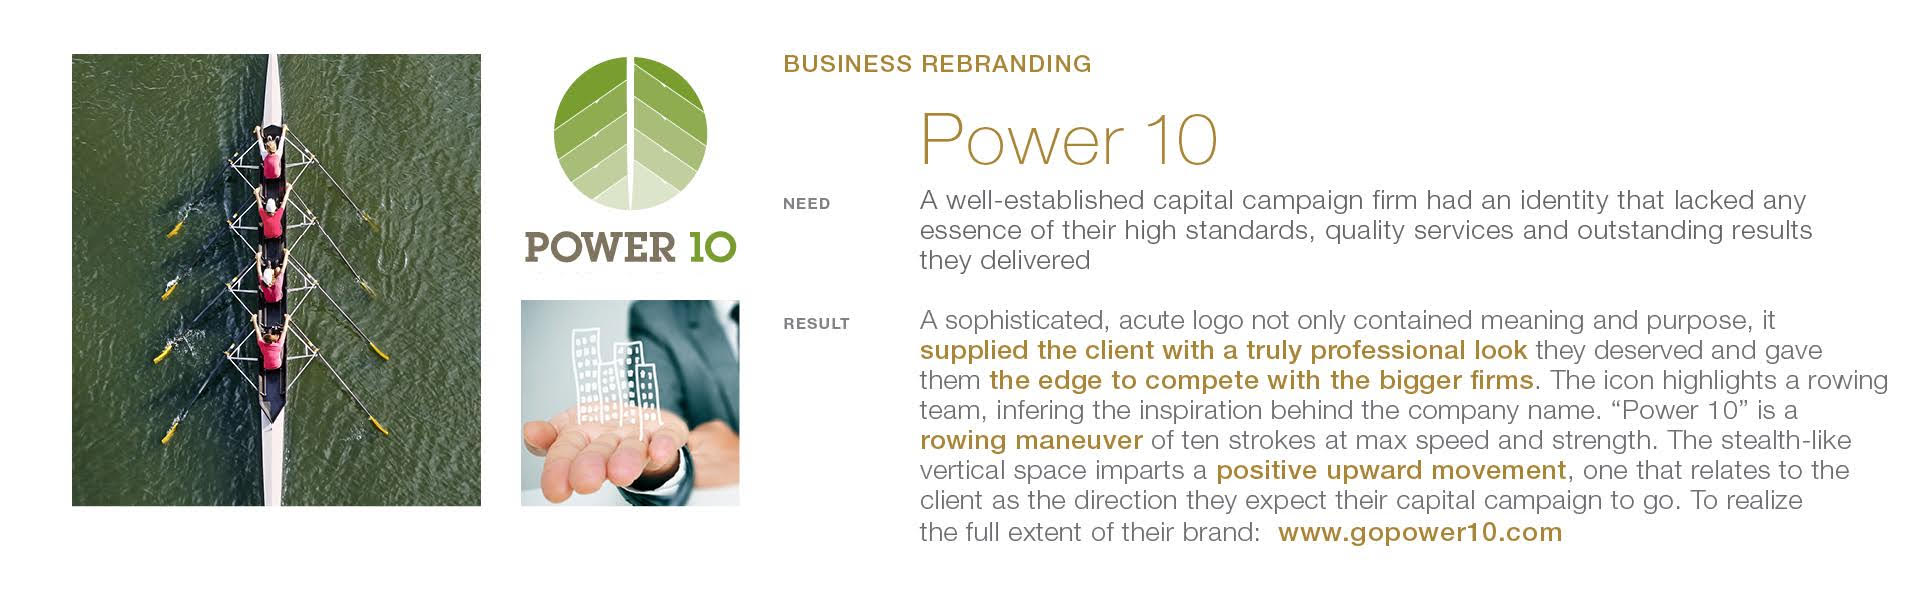 power-10-branding